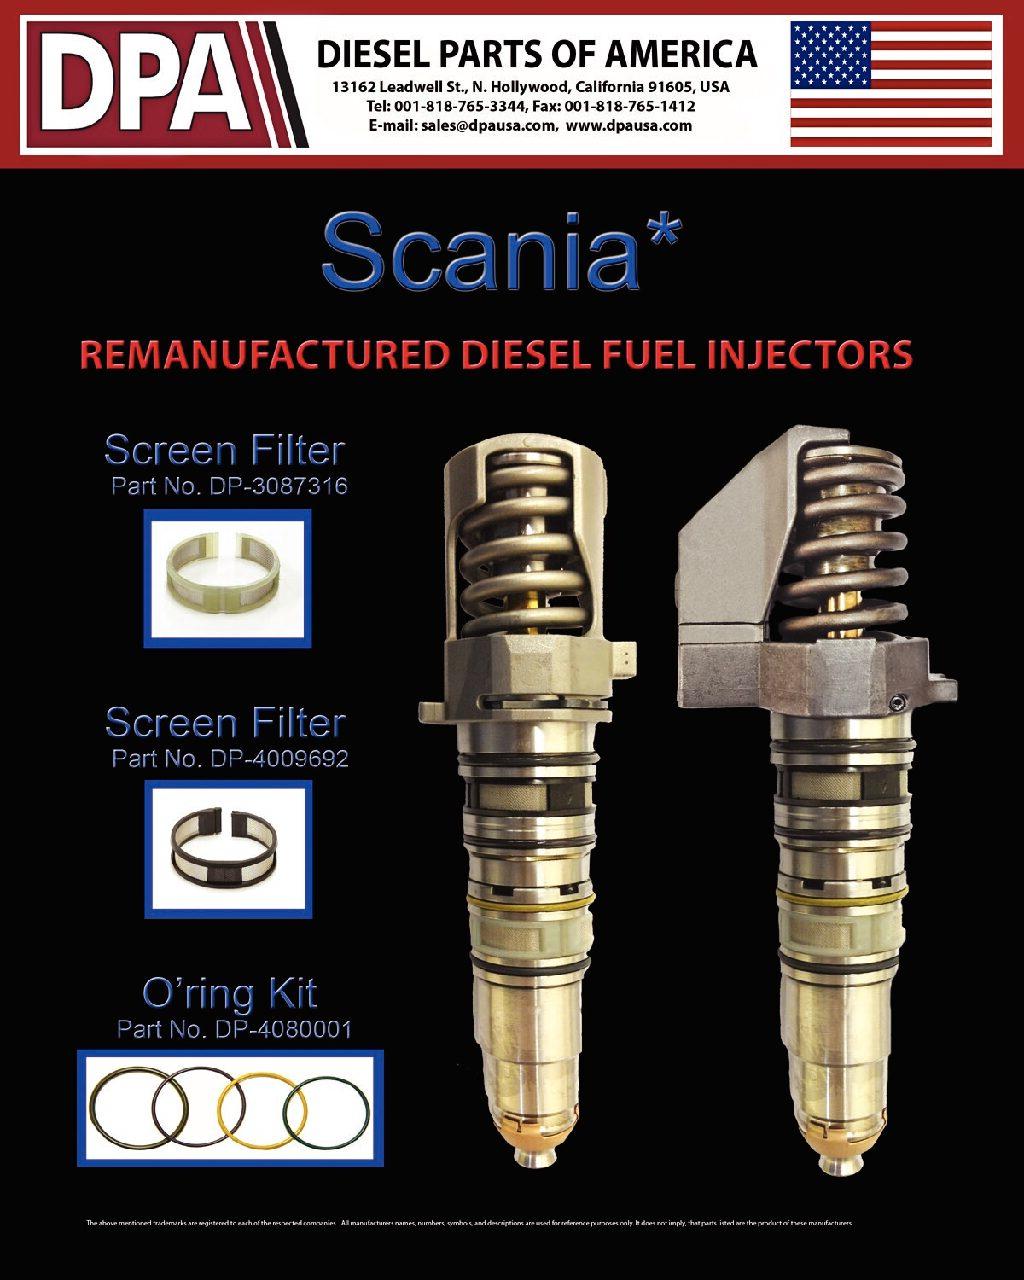 dpa_scania_injector-pdf.jpg